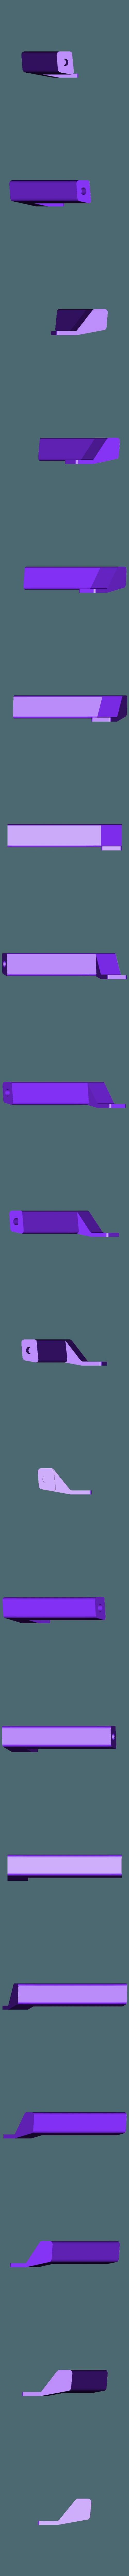 GorenjeP1fridge_mcko.stl Download STL file Gorenje fridge handle • 3D printable model, mcko